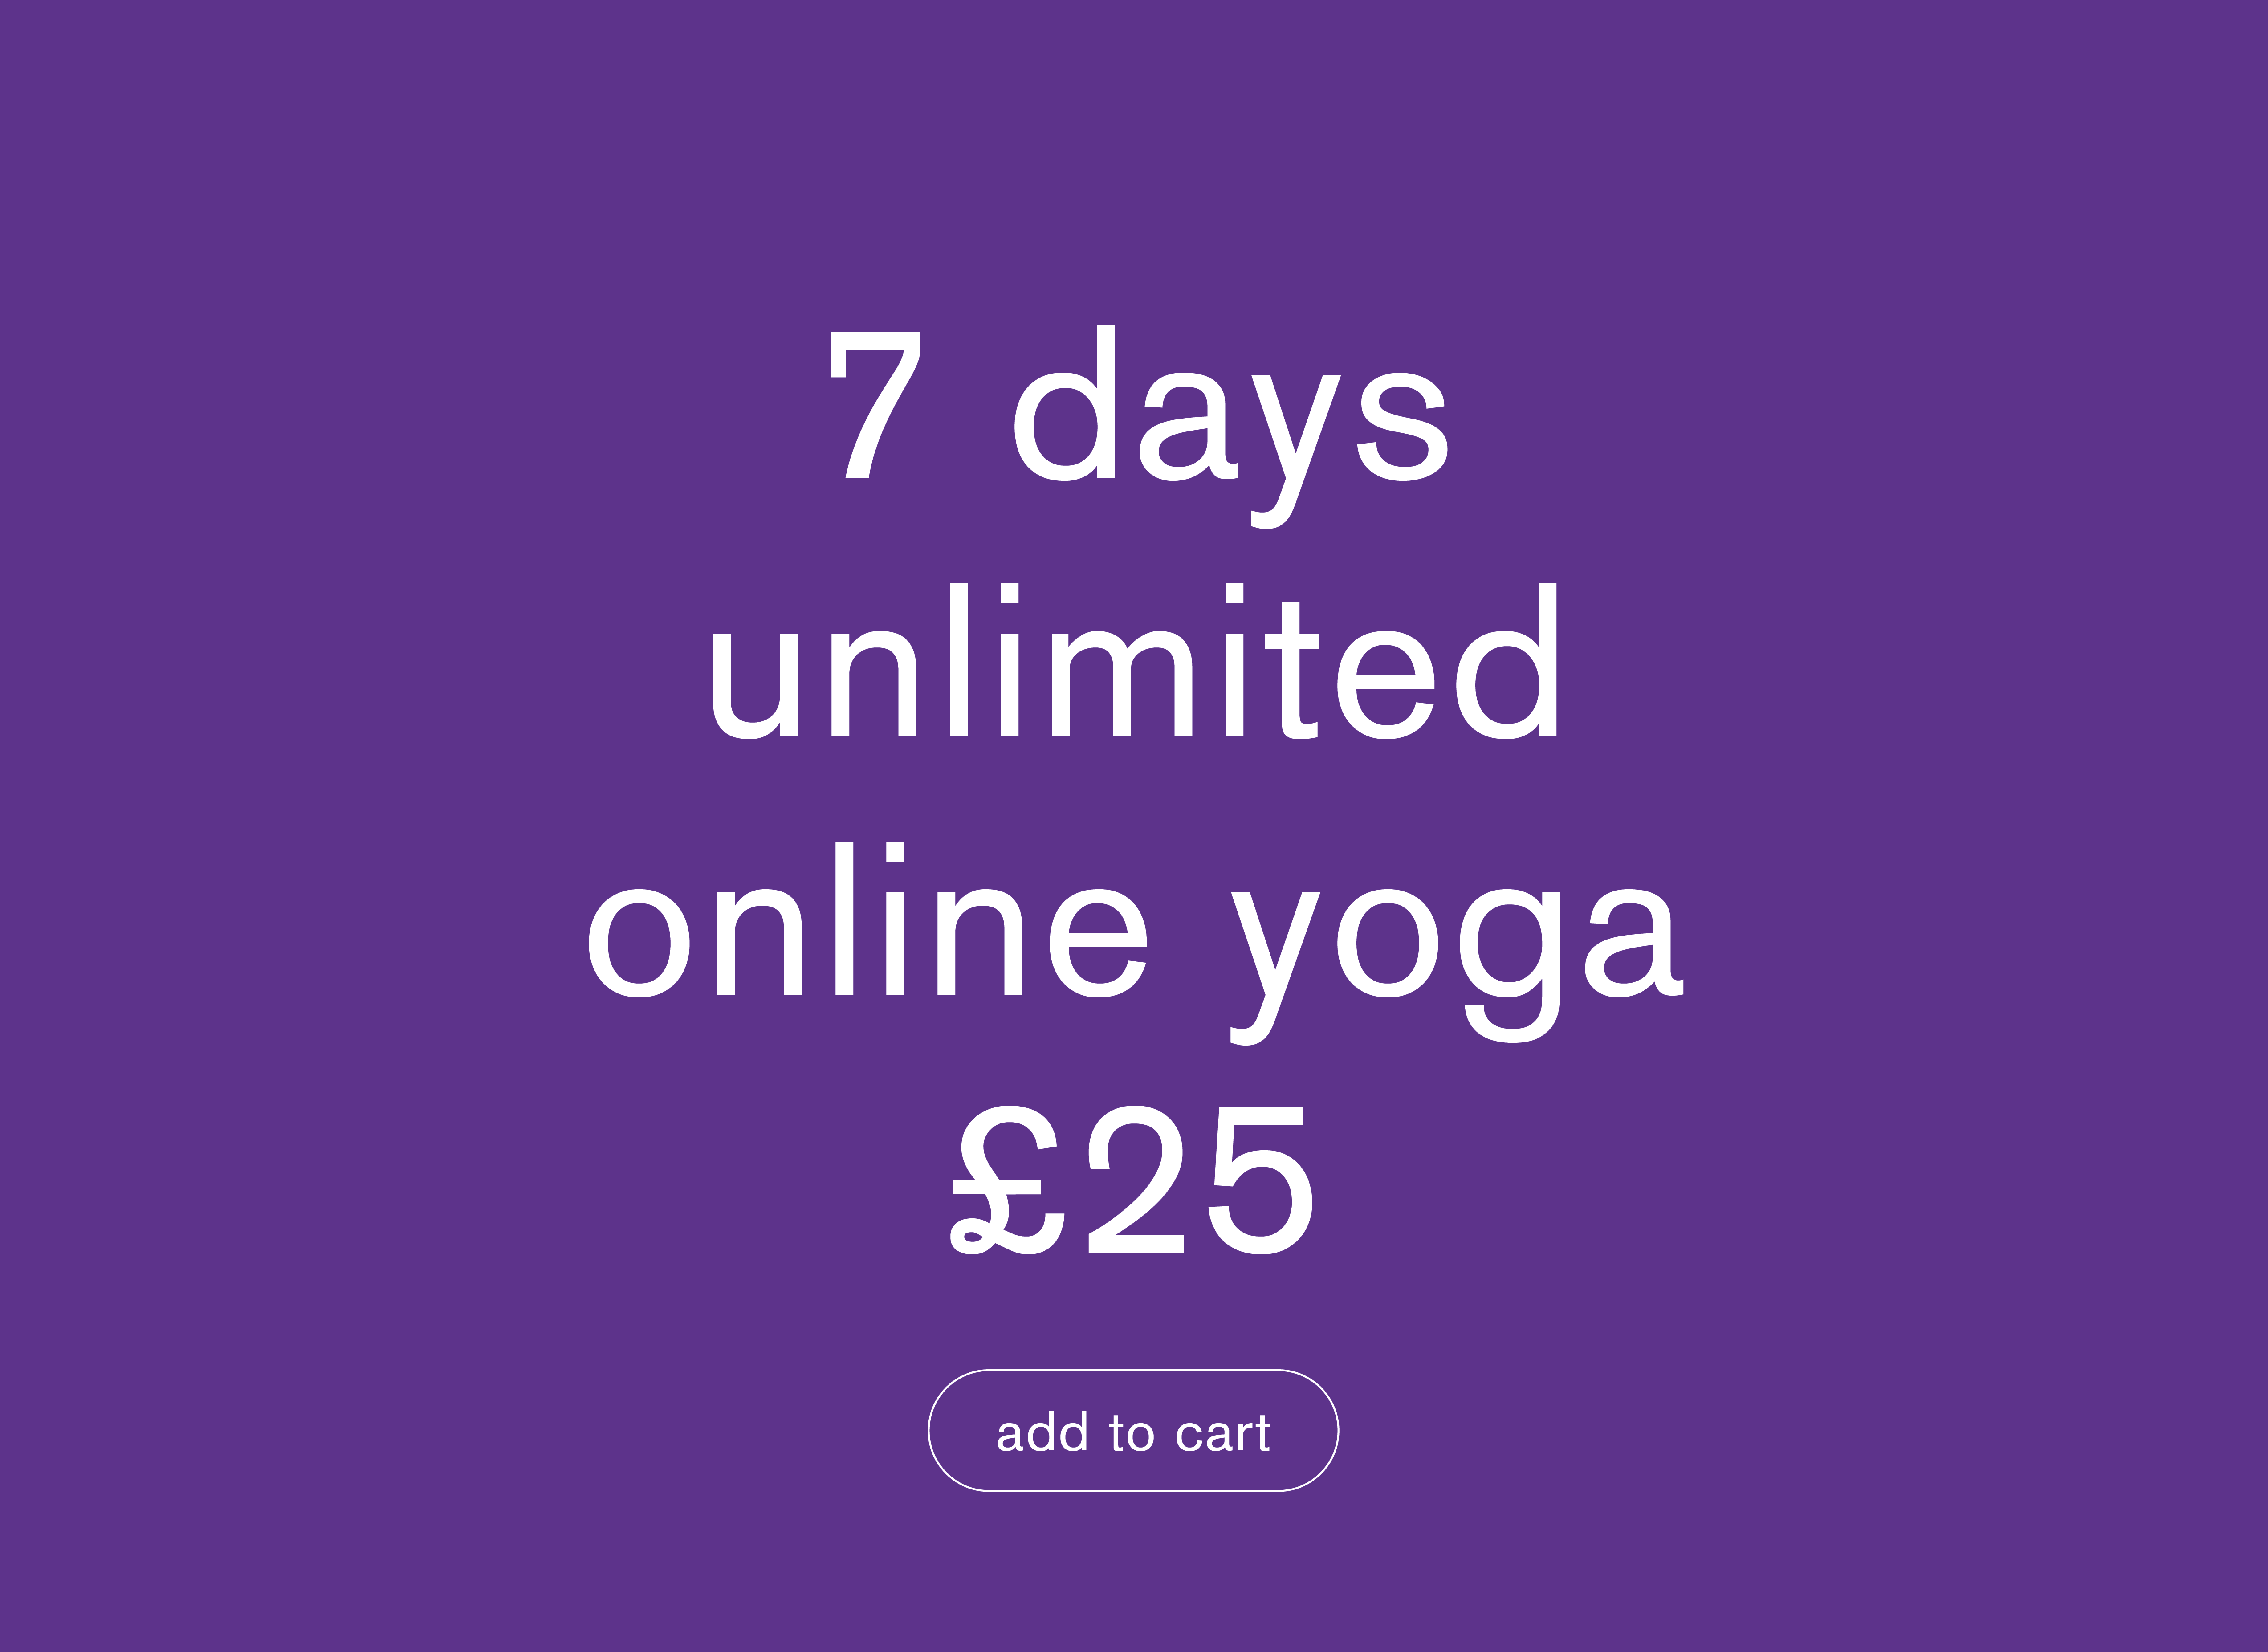 7 days unlimited online yoga £25